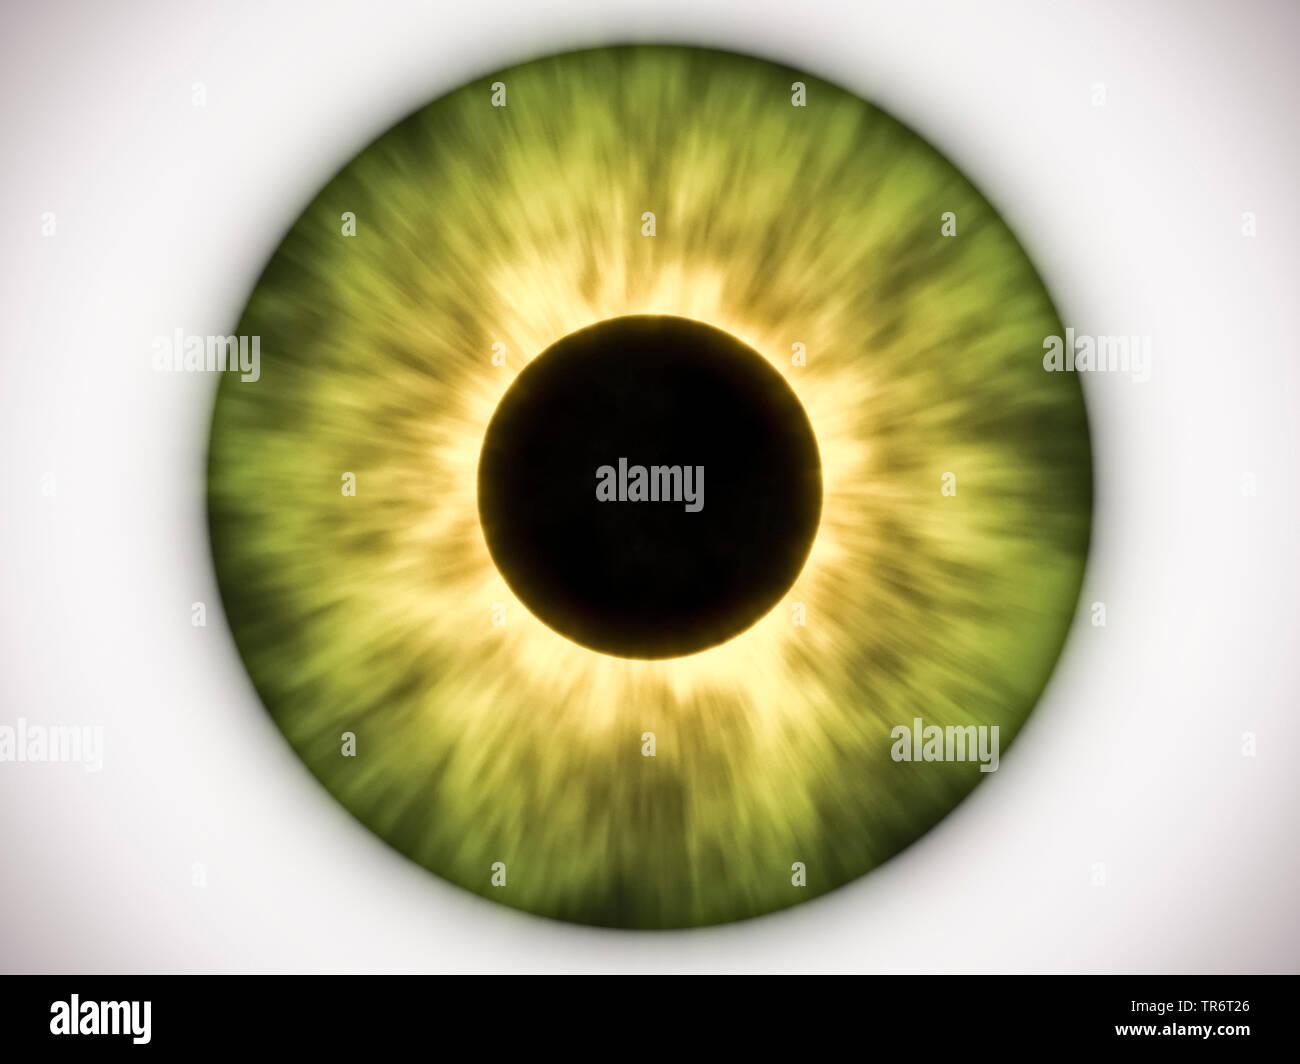 Persone, esseri umani, esseri umani (Homo sapiens sapiens), green Eye ball Immagini Stock